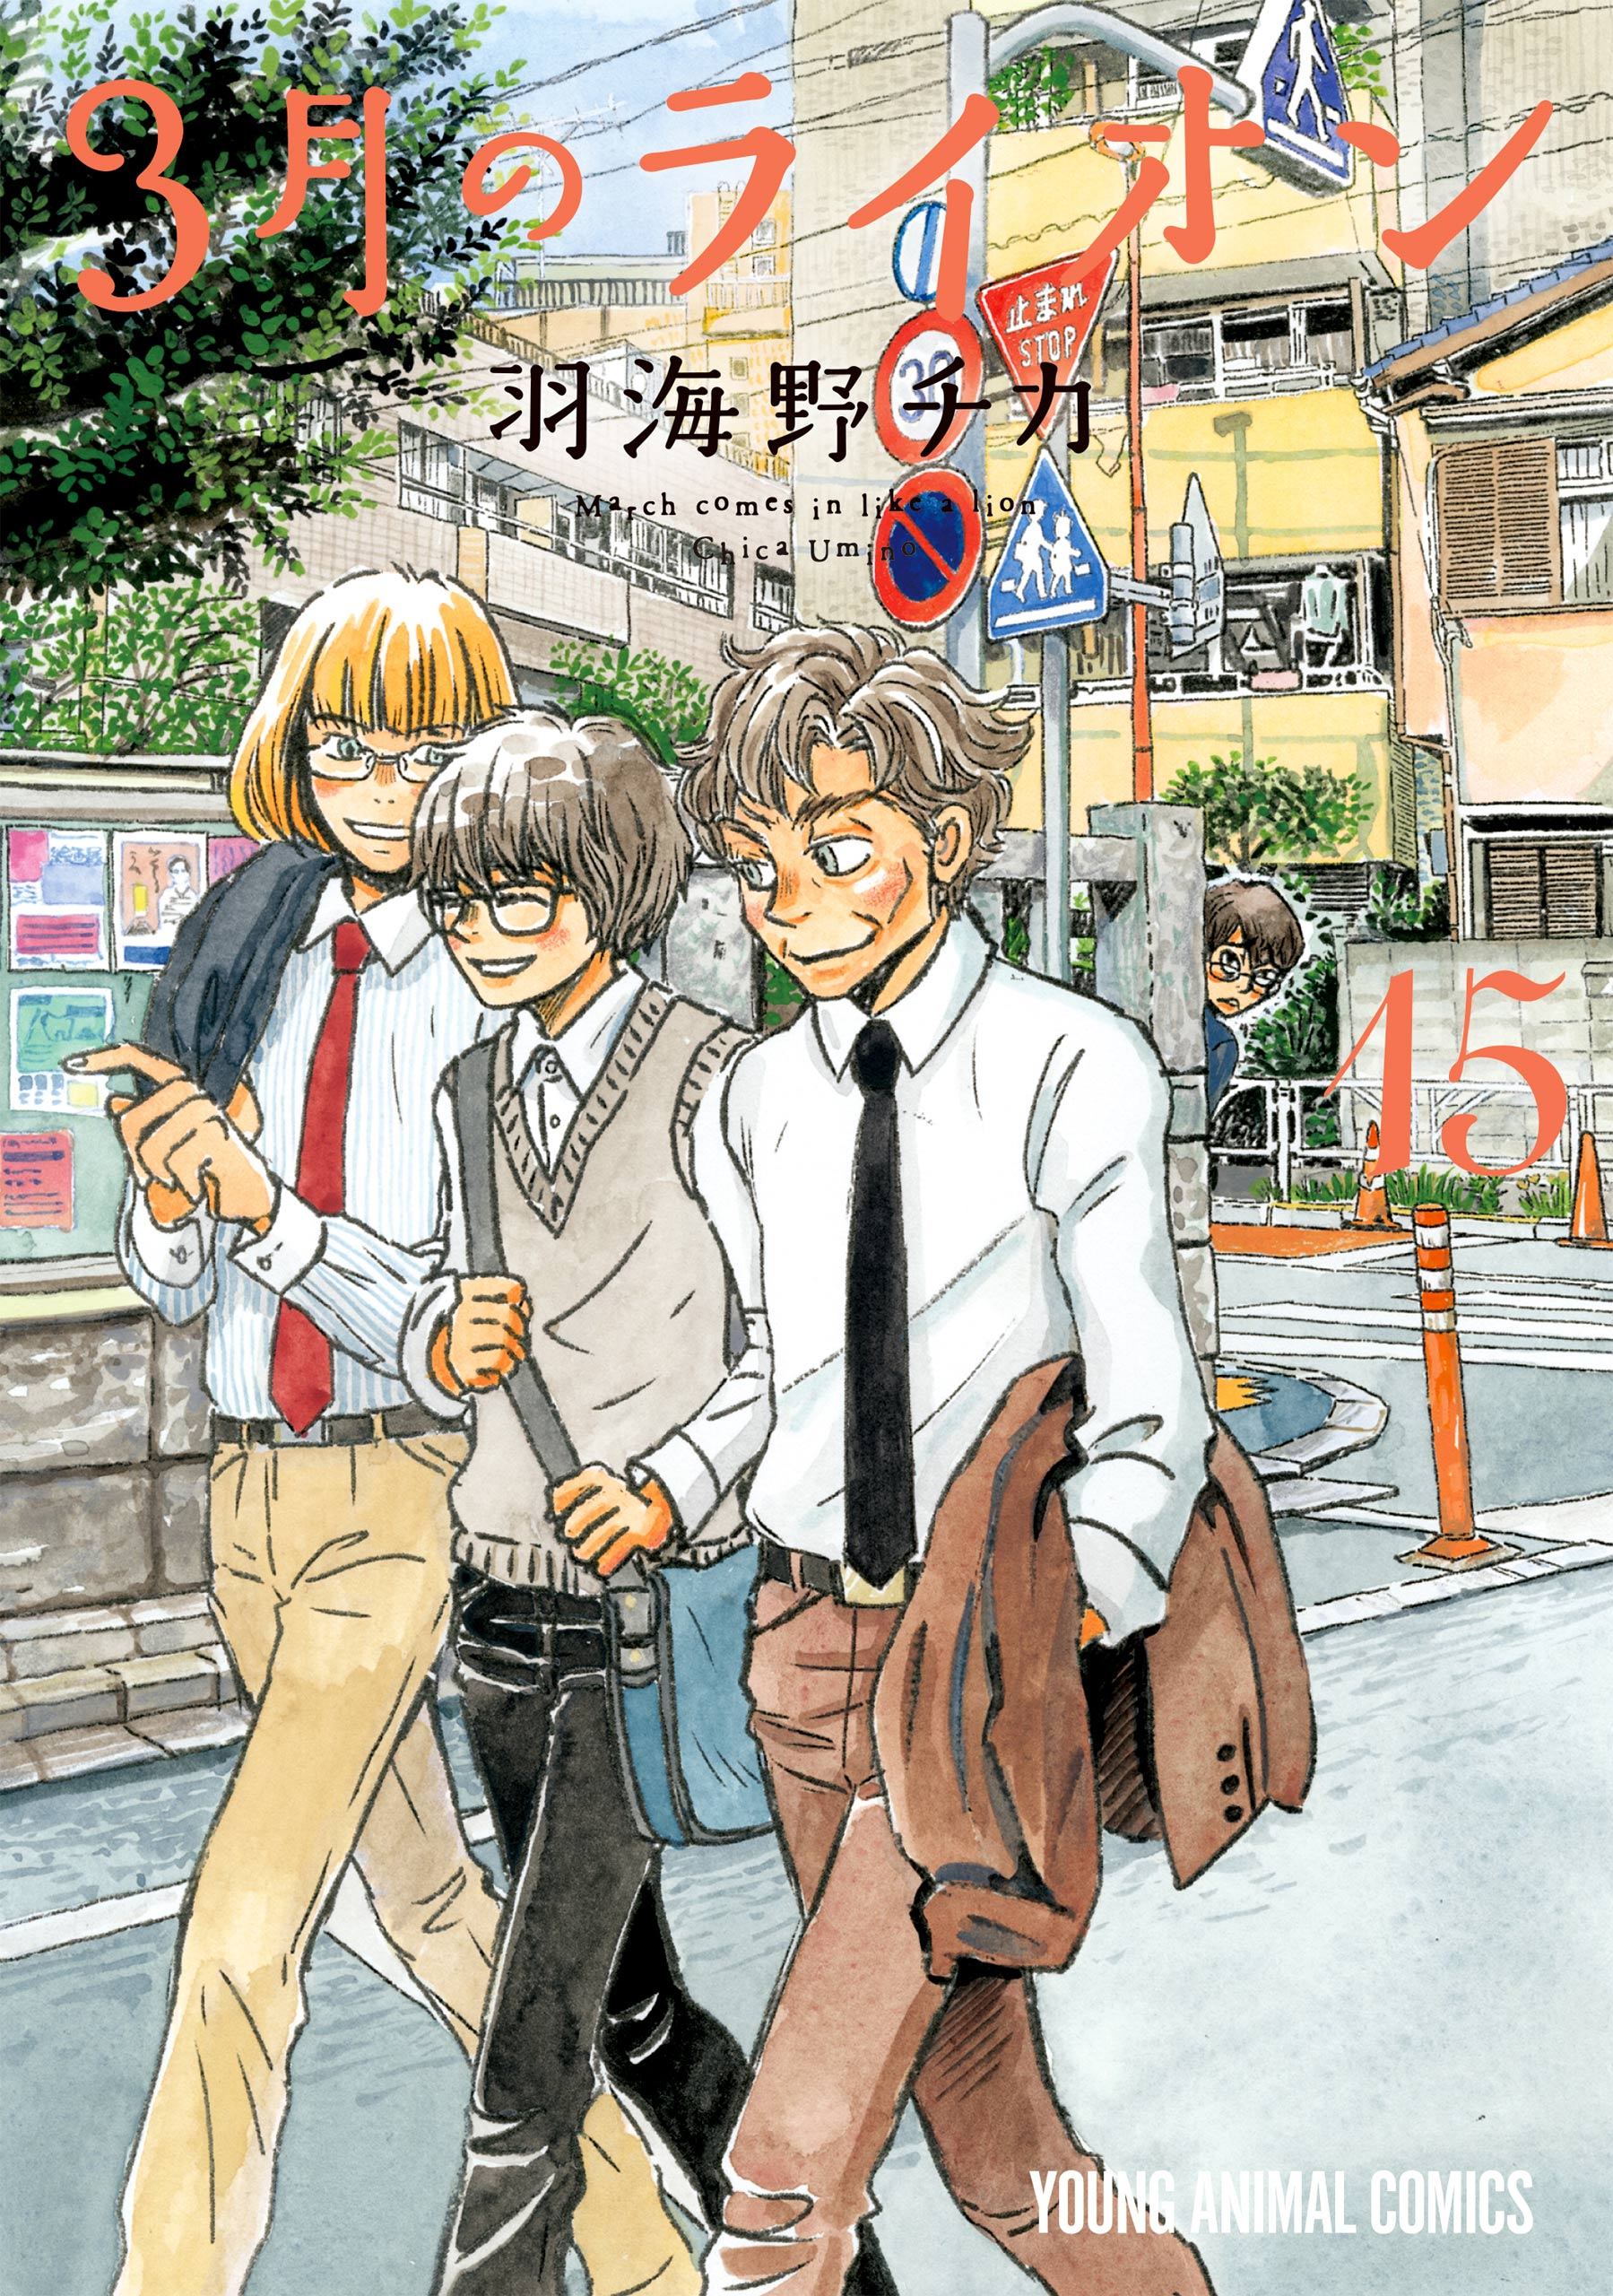 Cover Volume 15